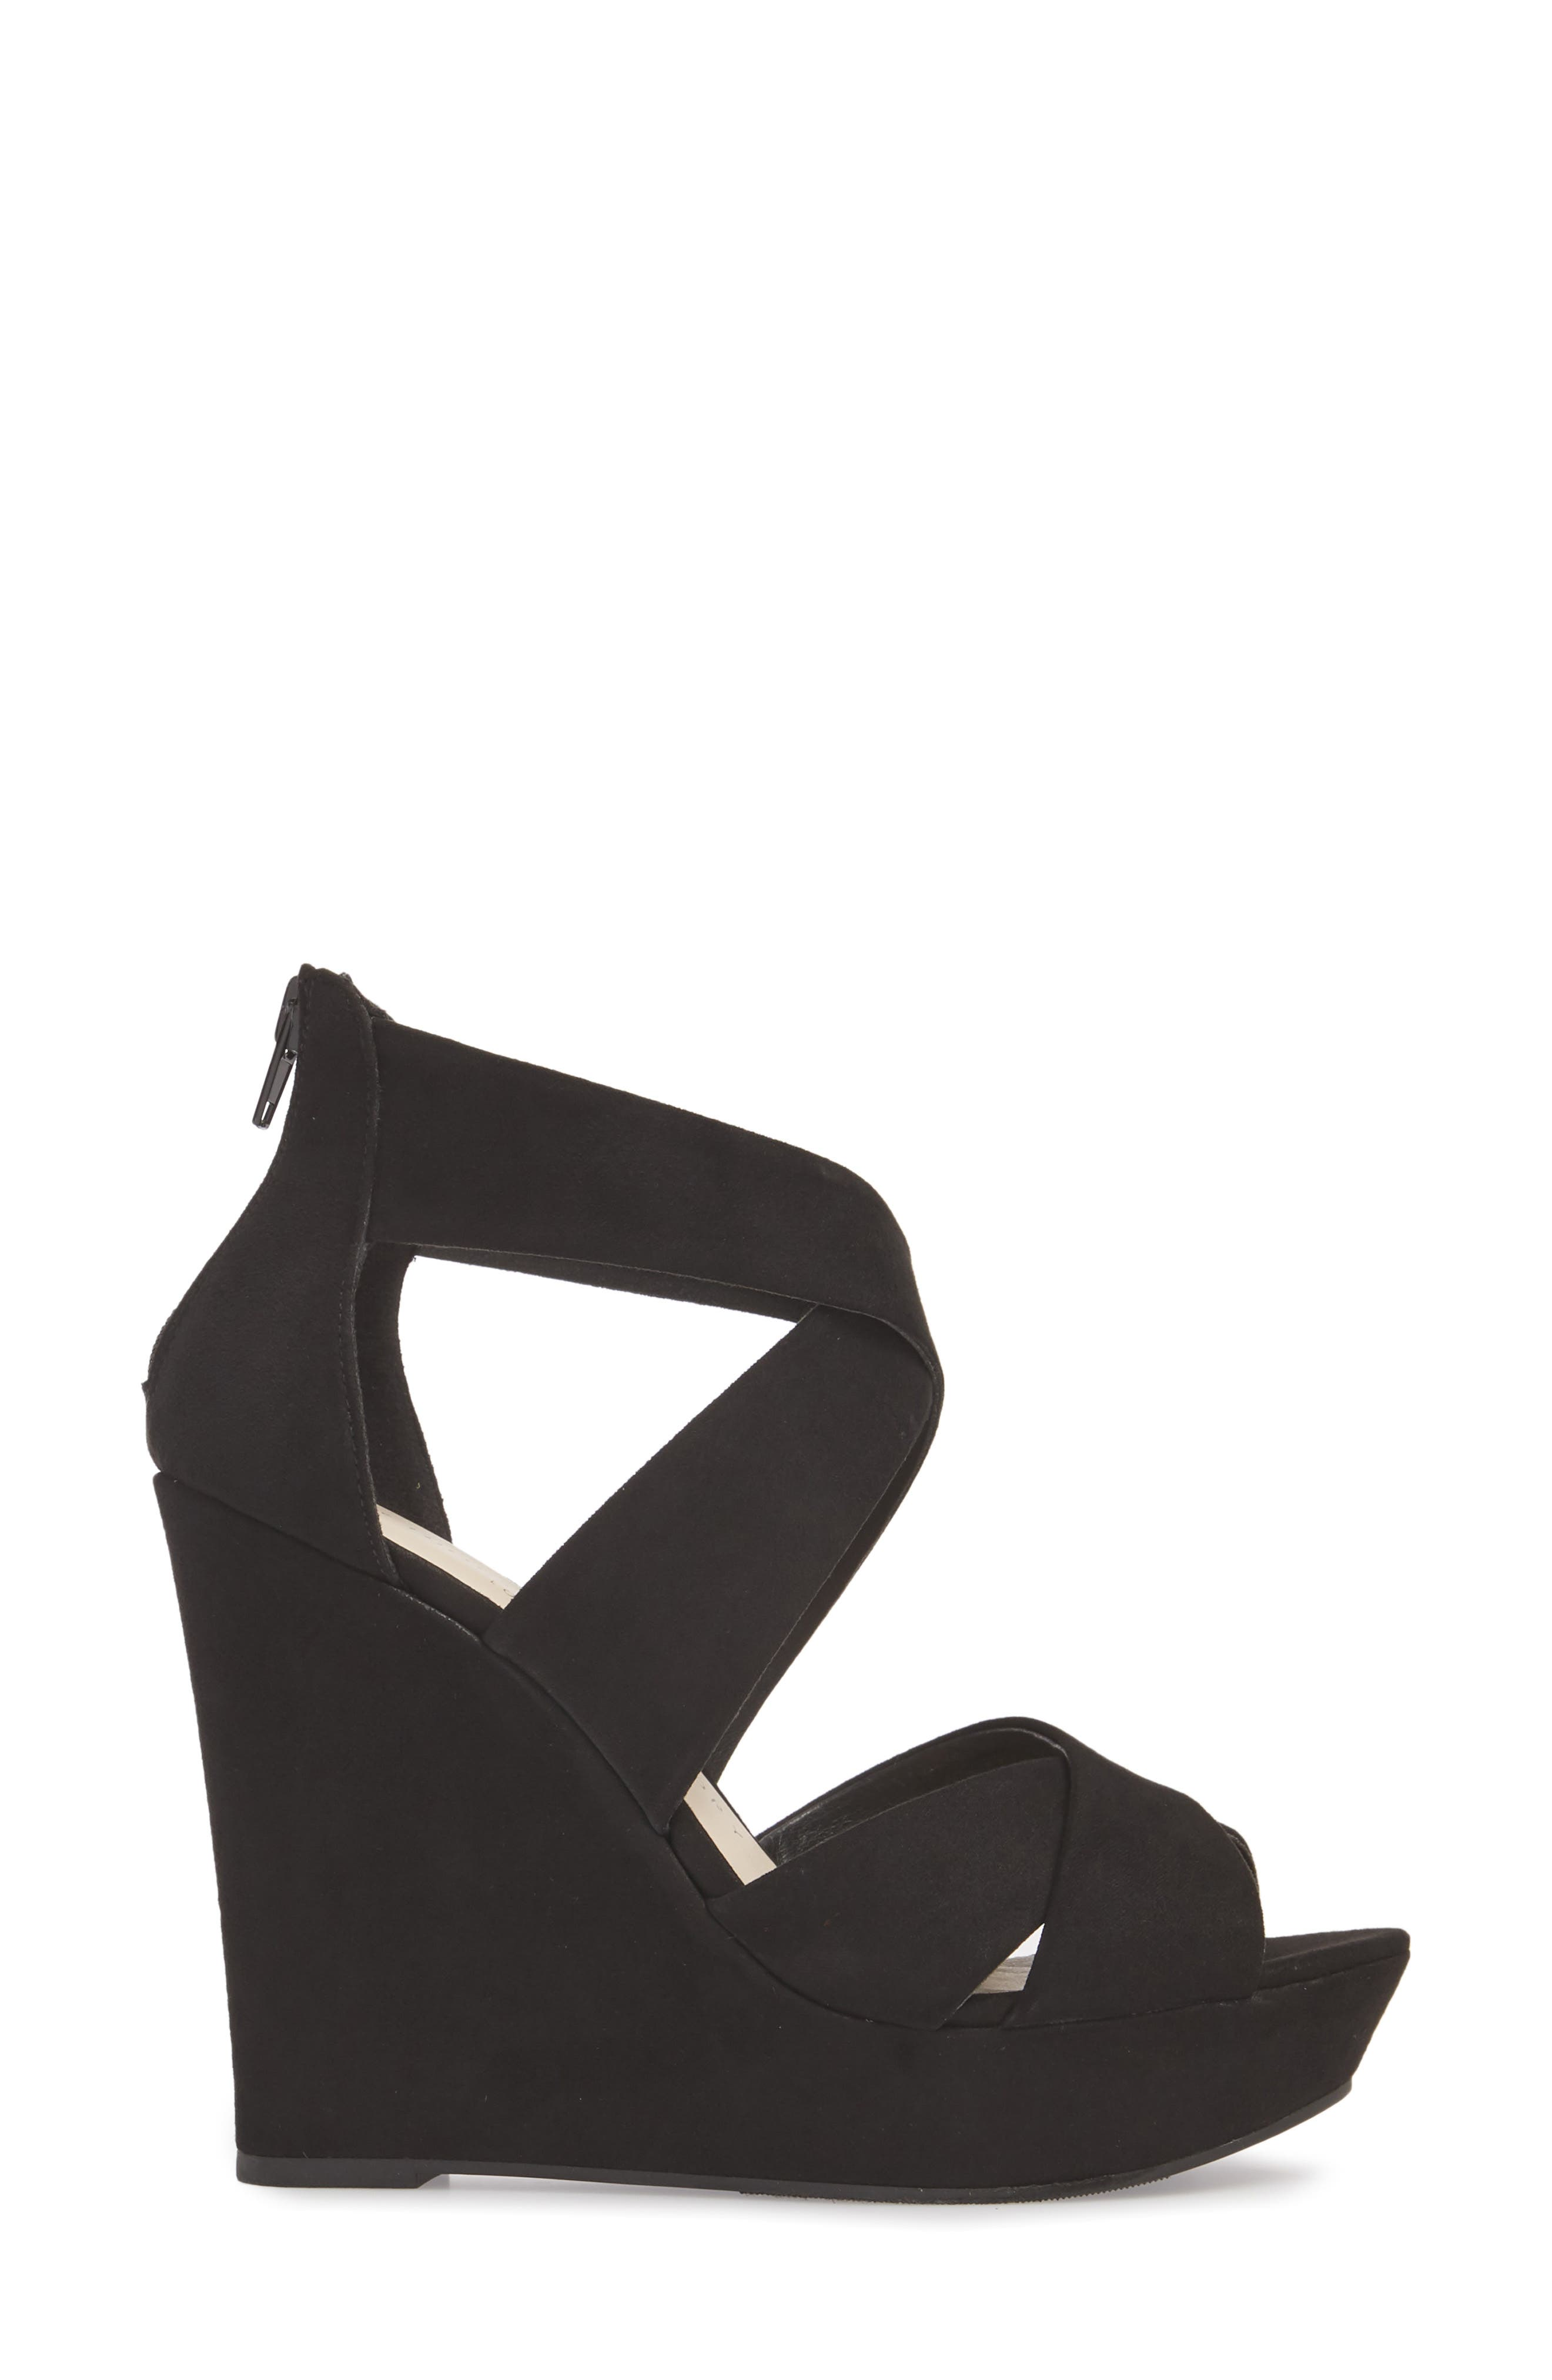 Milani Platform Wedge Sandal,                             Alternate thumbnail 3, color,                             005